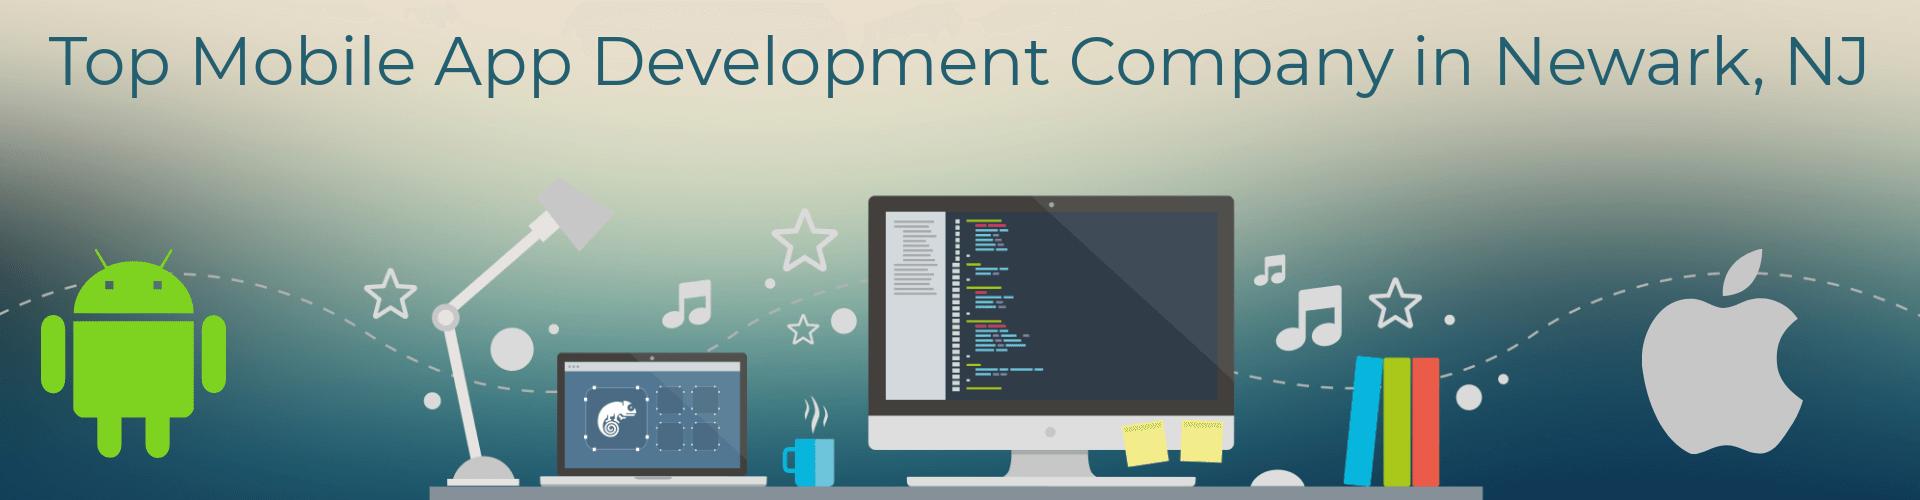 mobile app development company newark